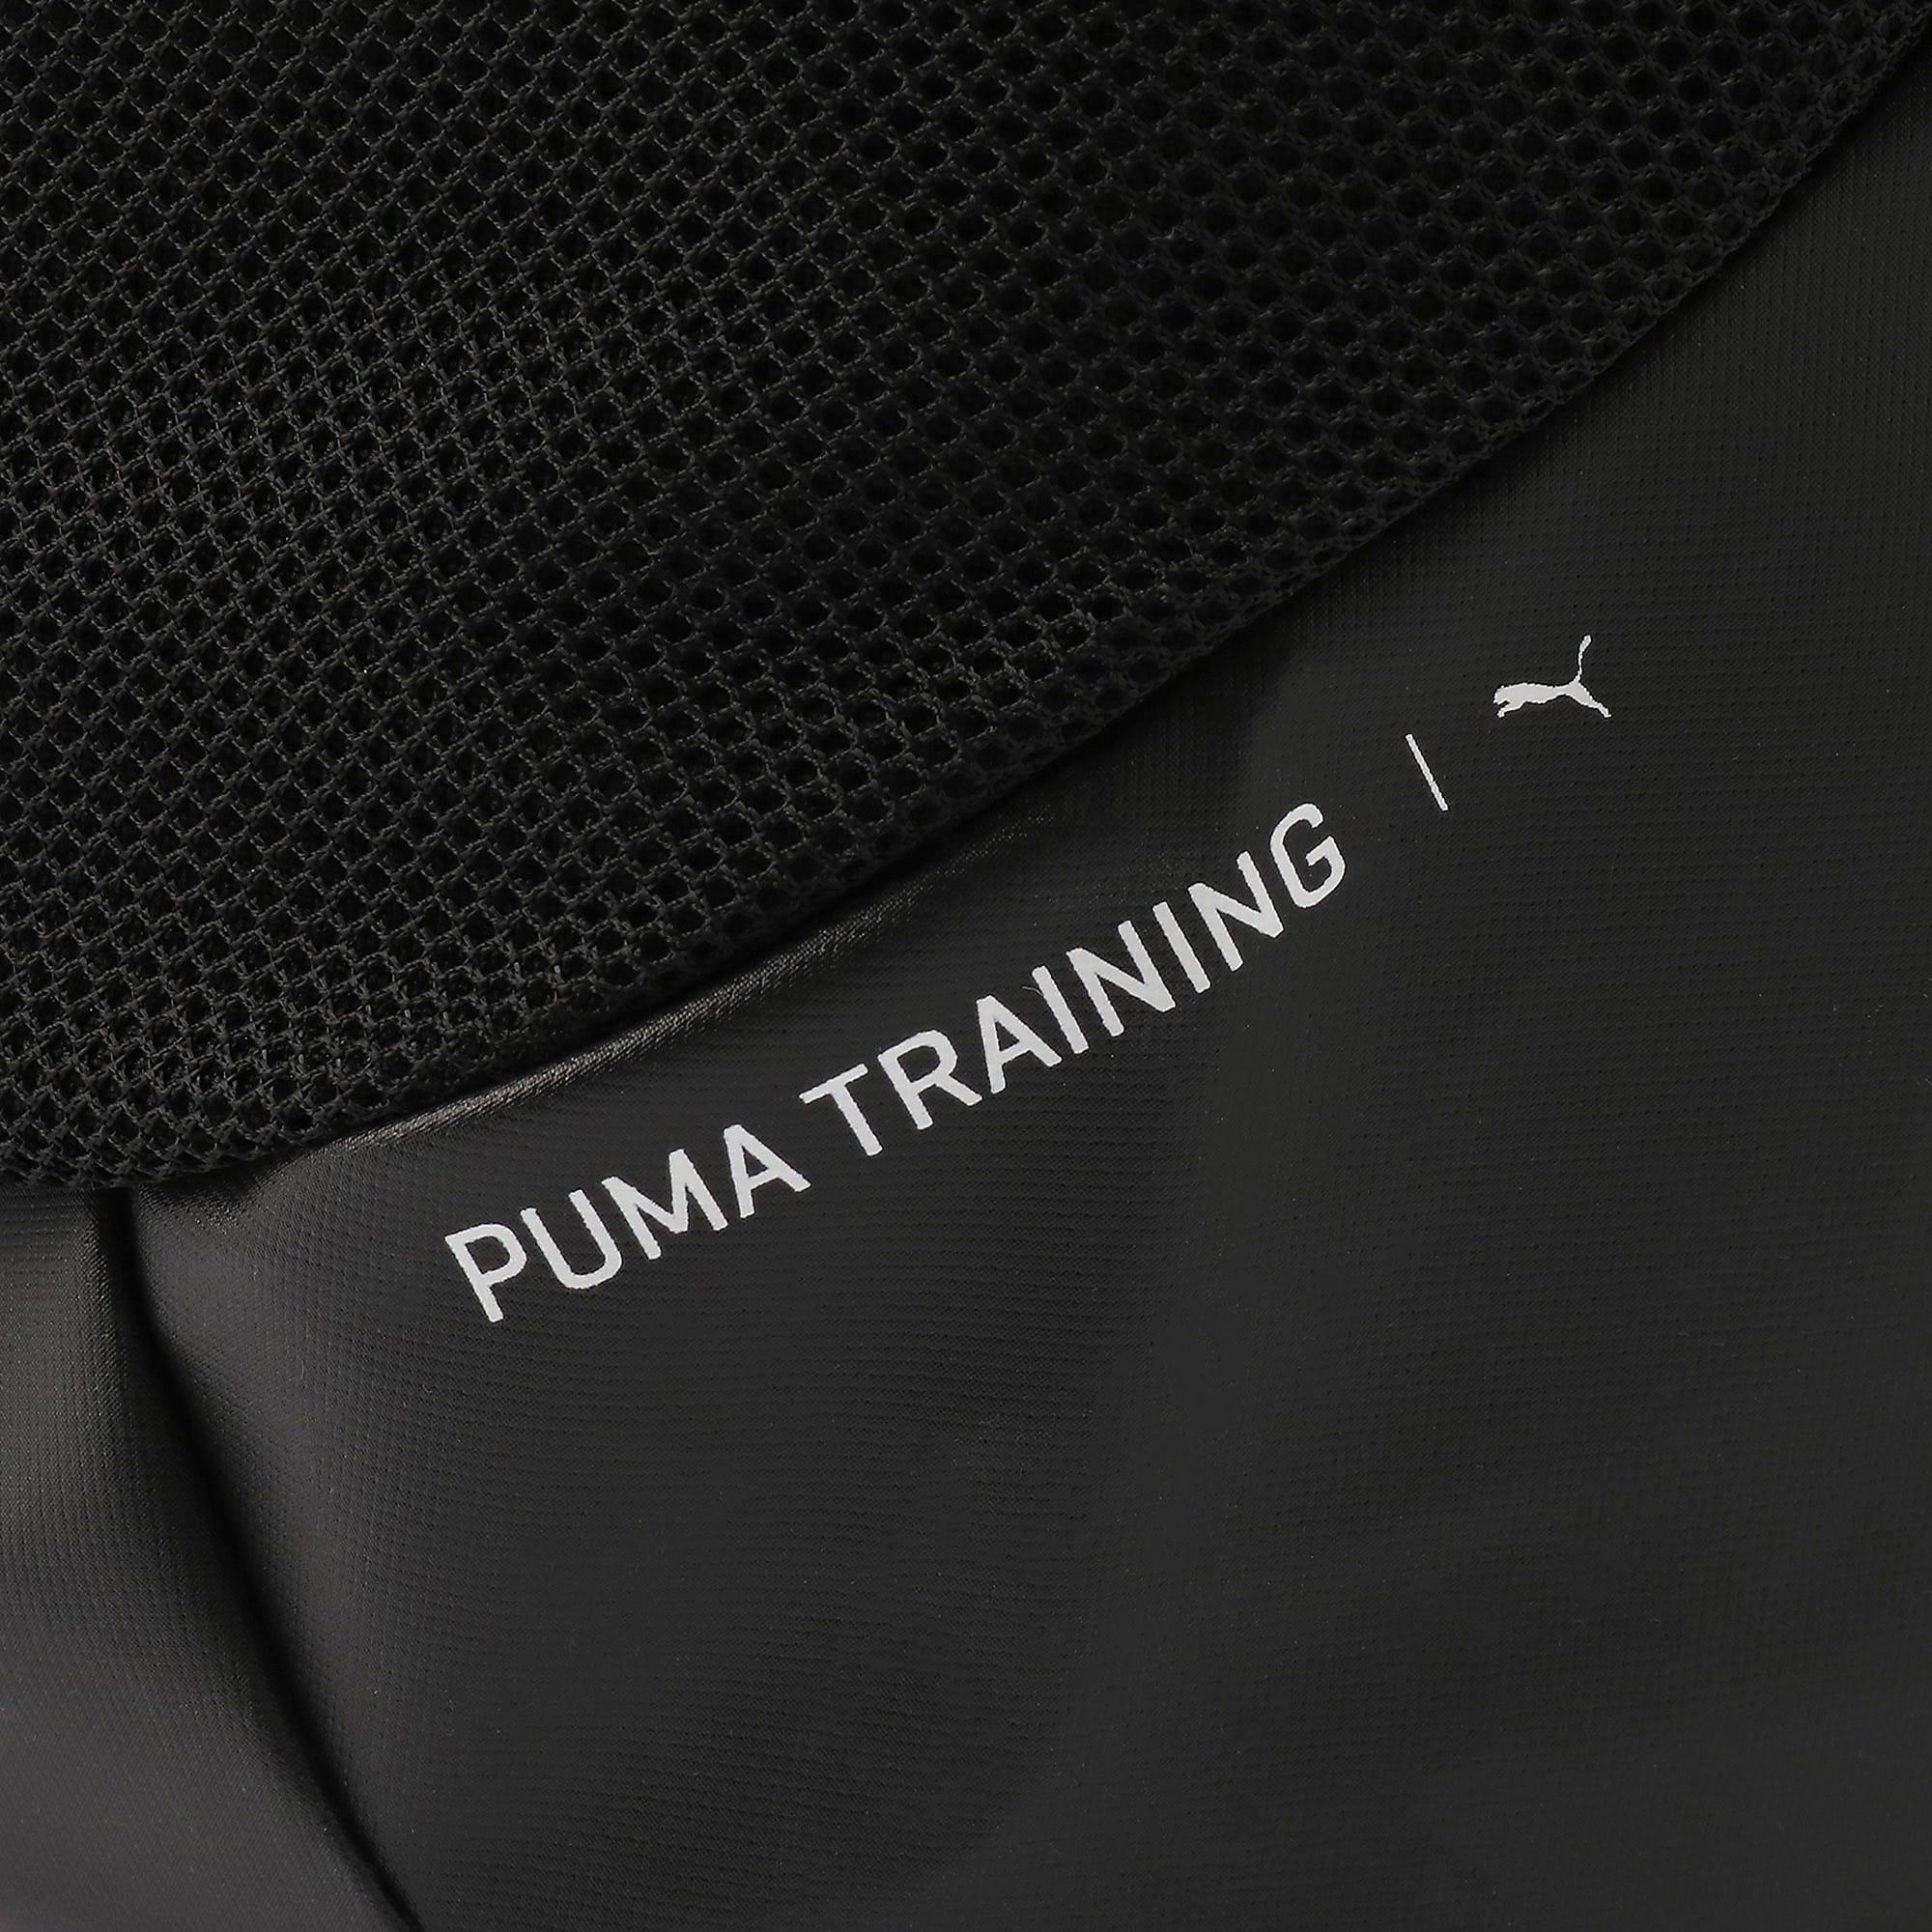 Thumbnail 11 of ジム ダッフル バッグ L 65L, Puma Black, medium-JPN